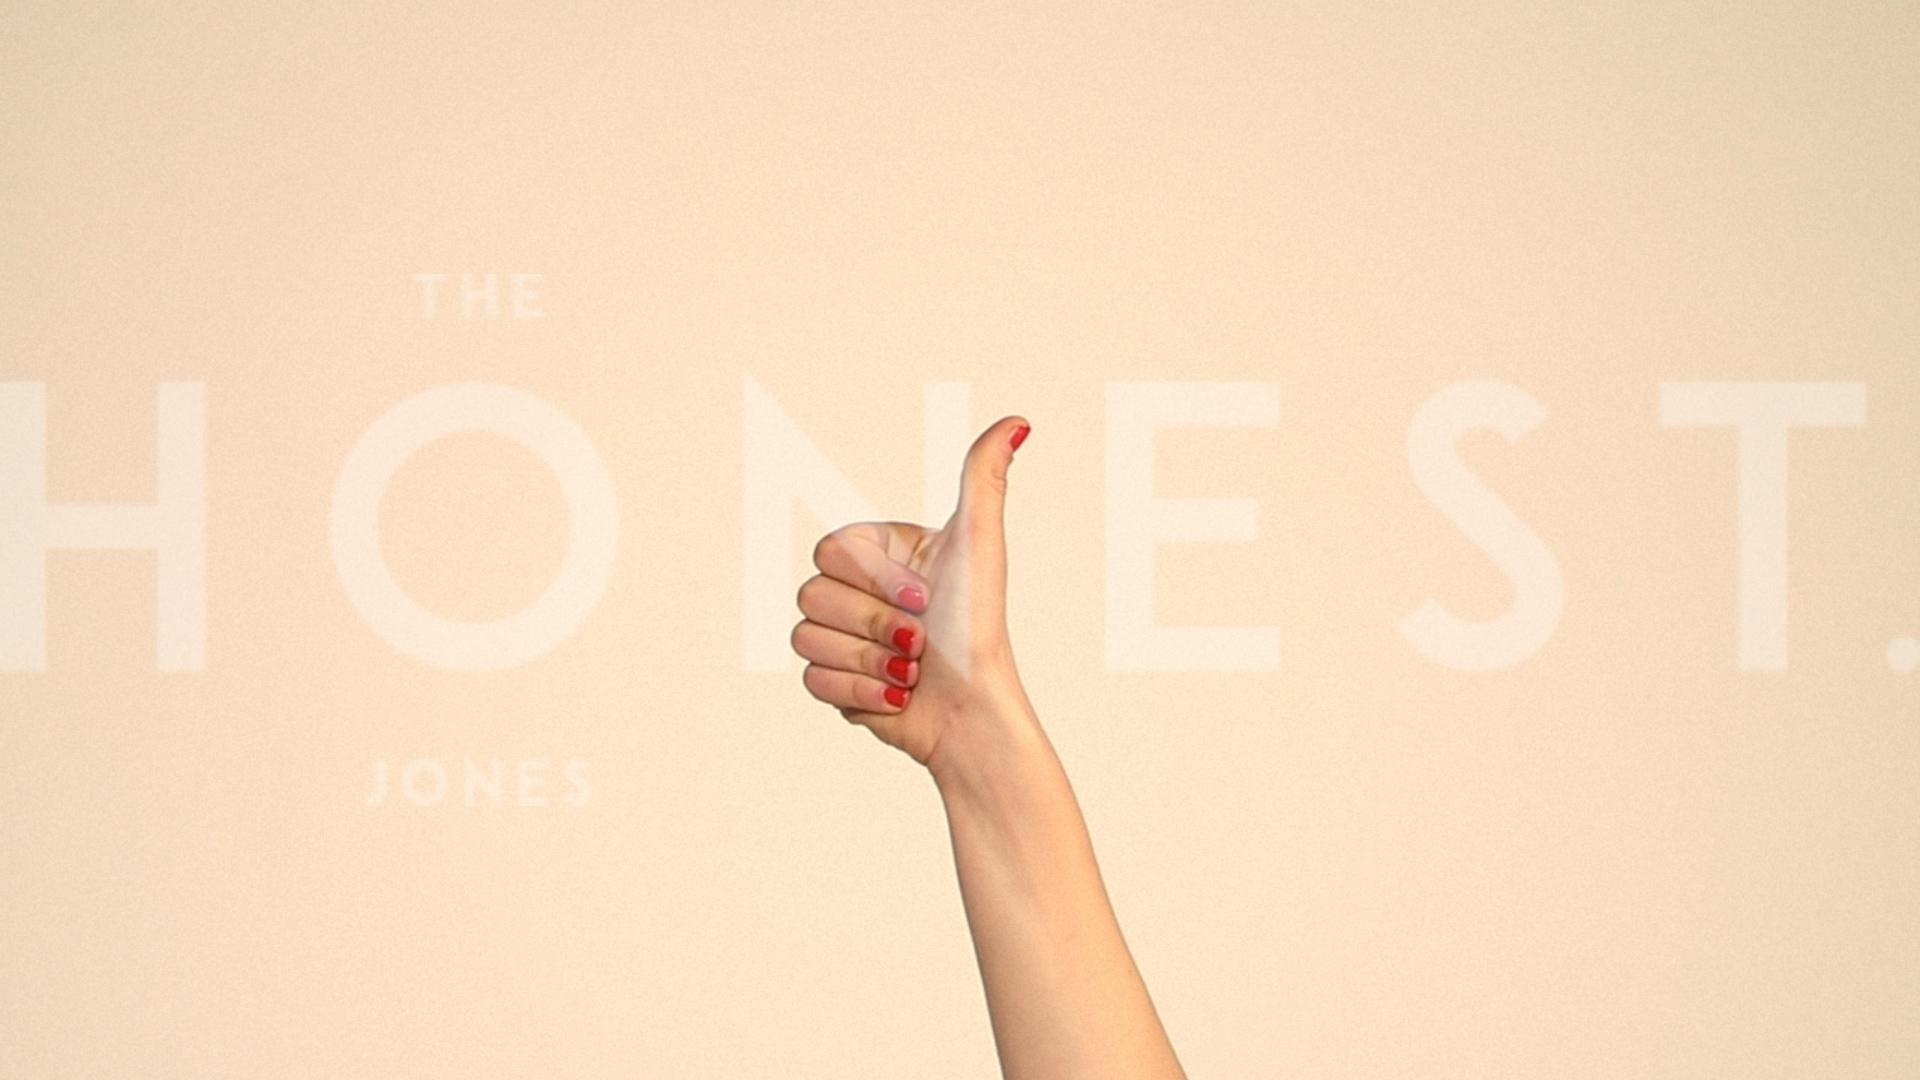 thumbs up_02.jpg